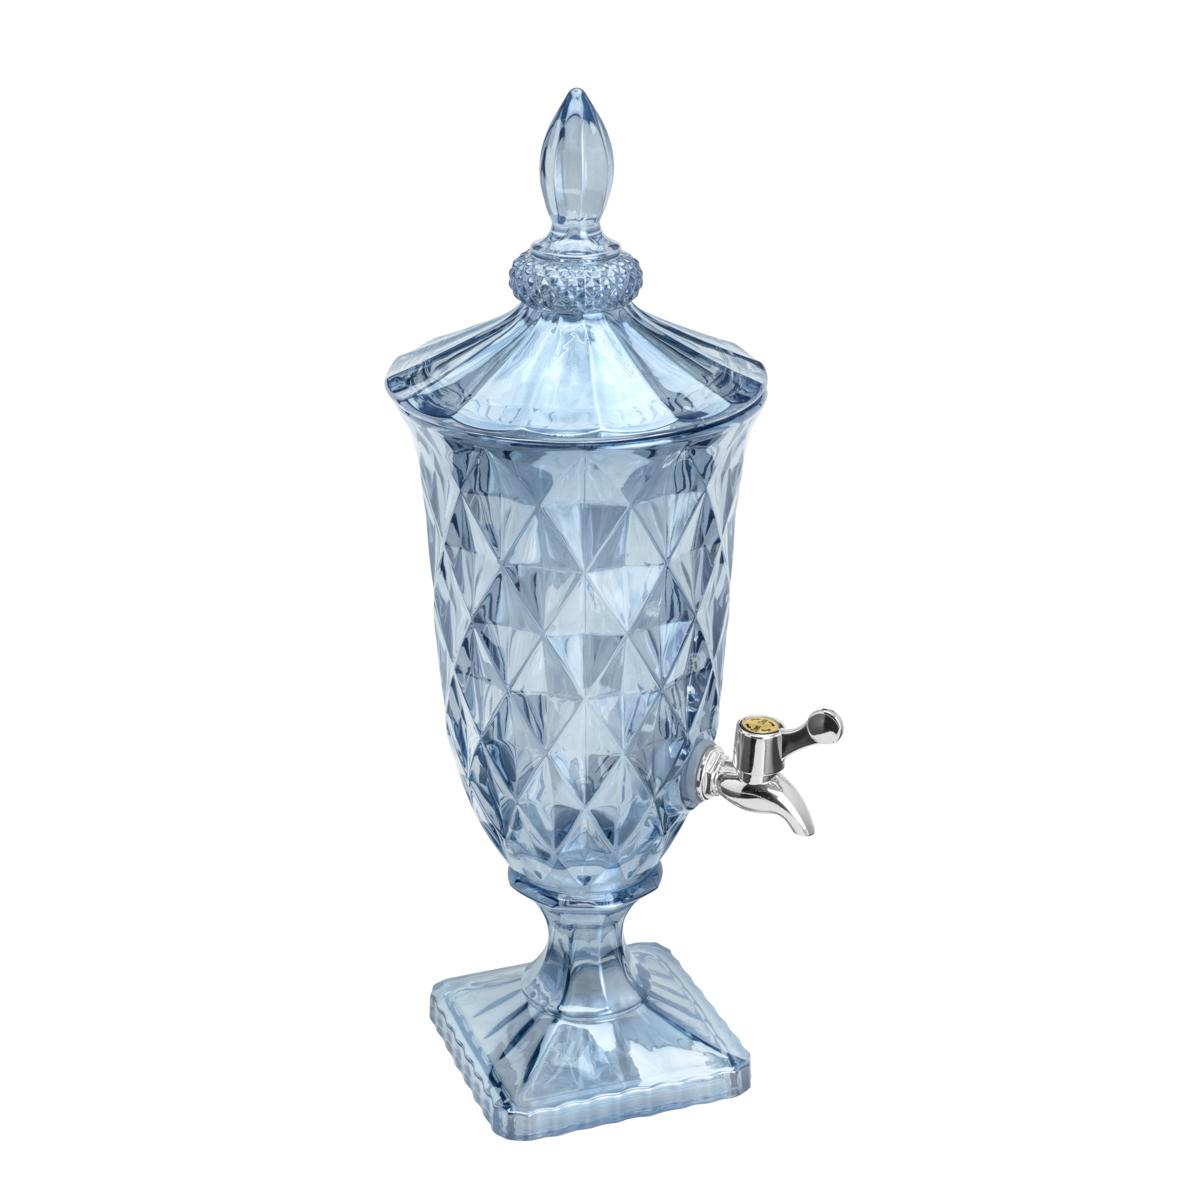 Suqueira De Cristal Ecológico Diamond Azul 2l Lyor